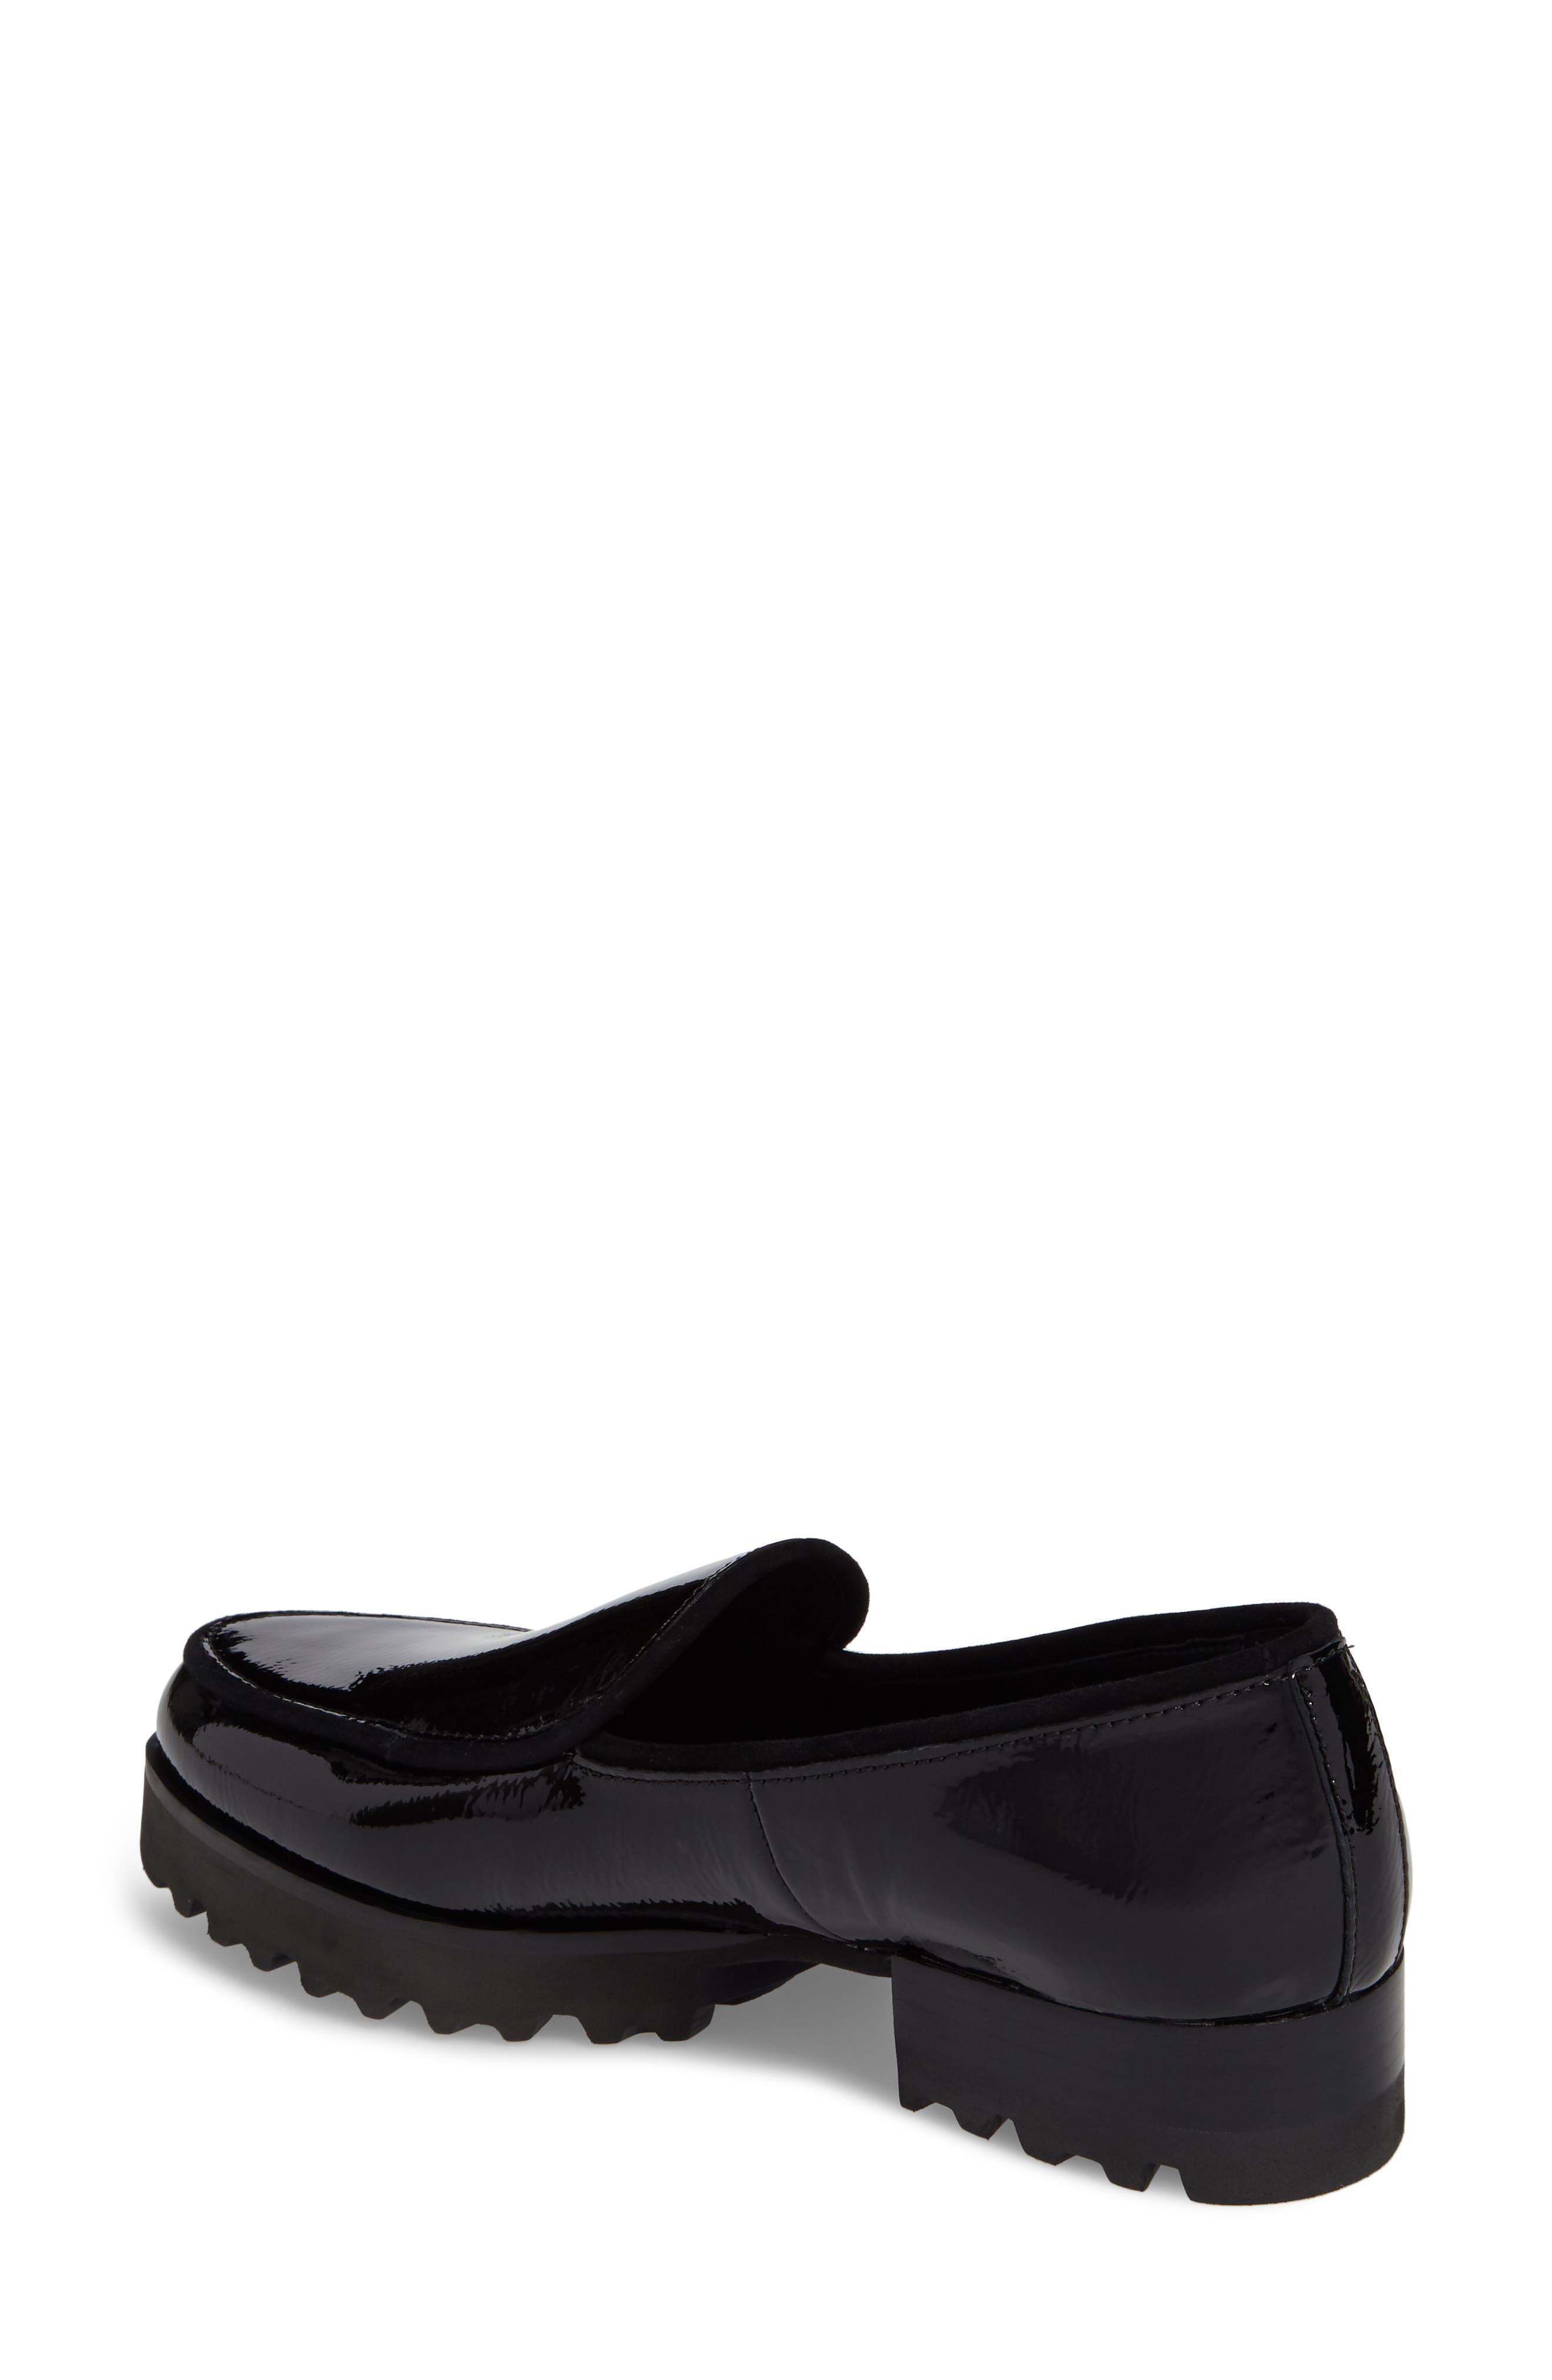 Elen Loafer,                             Alternate thumbnail 2, color,                             Black Leather